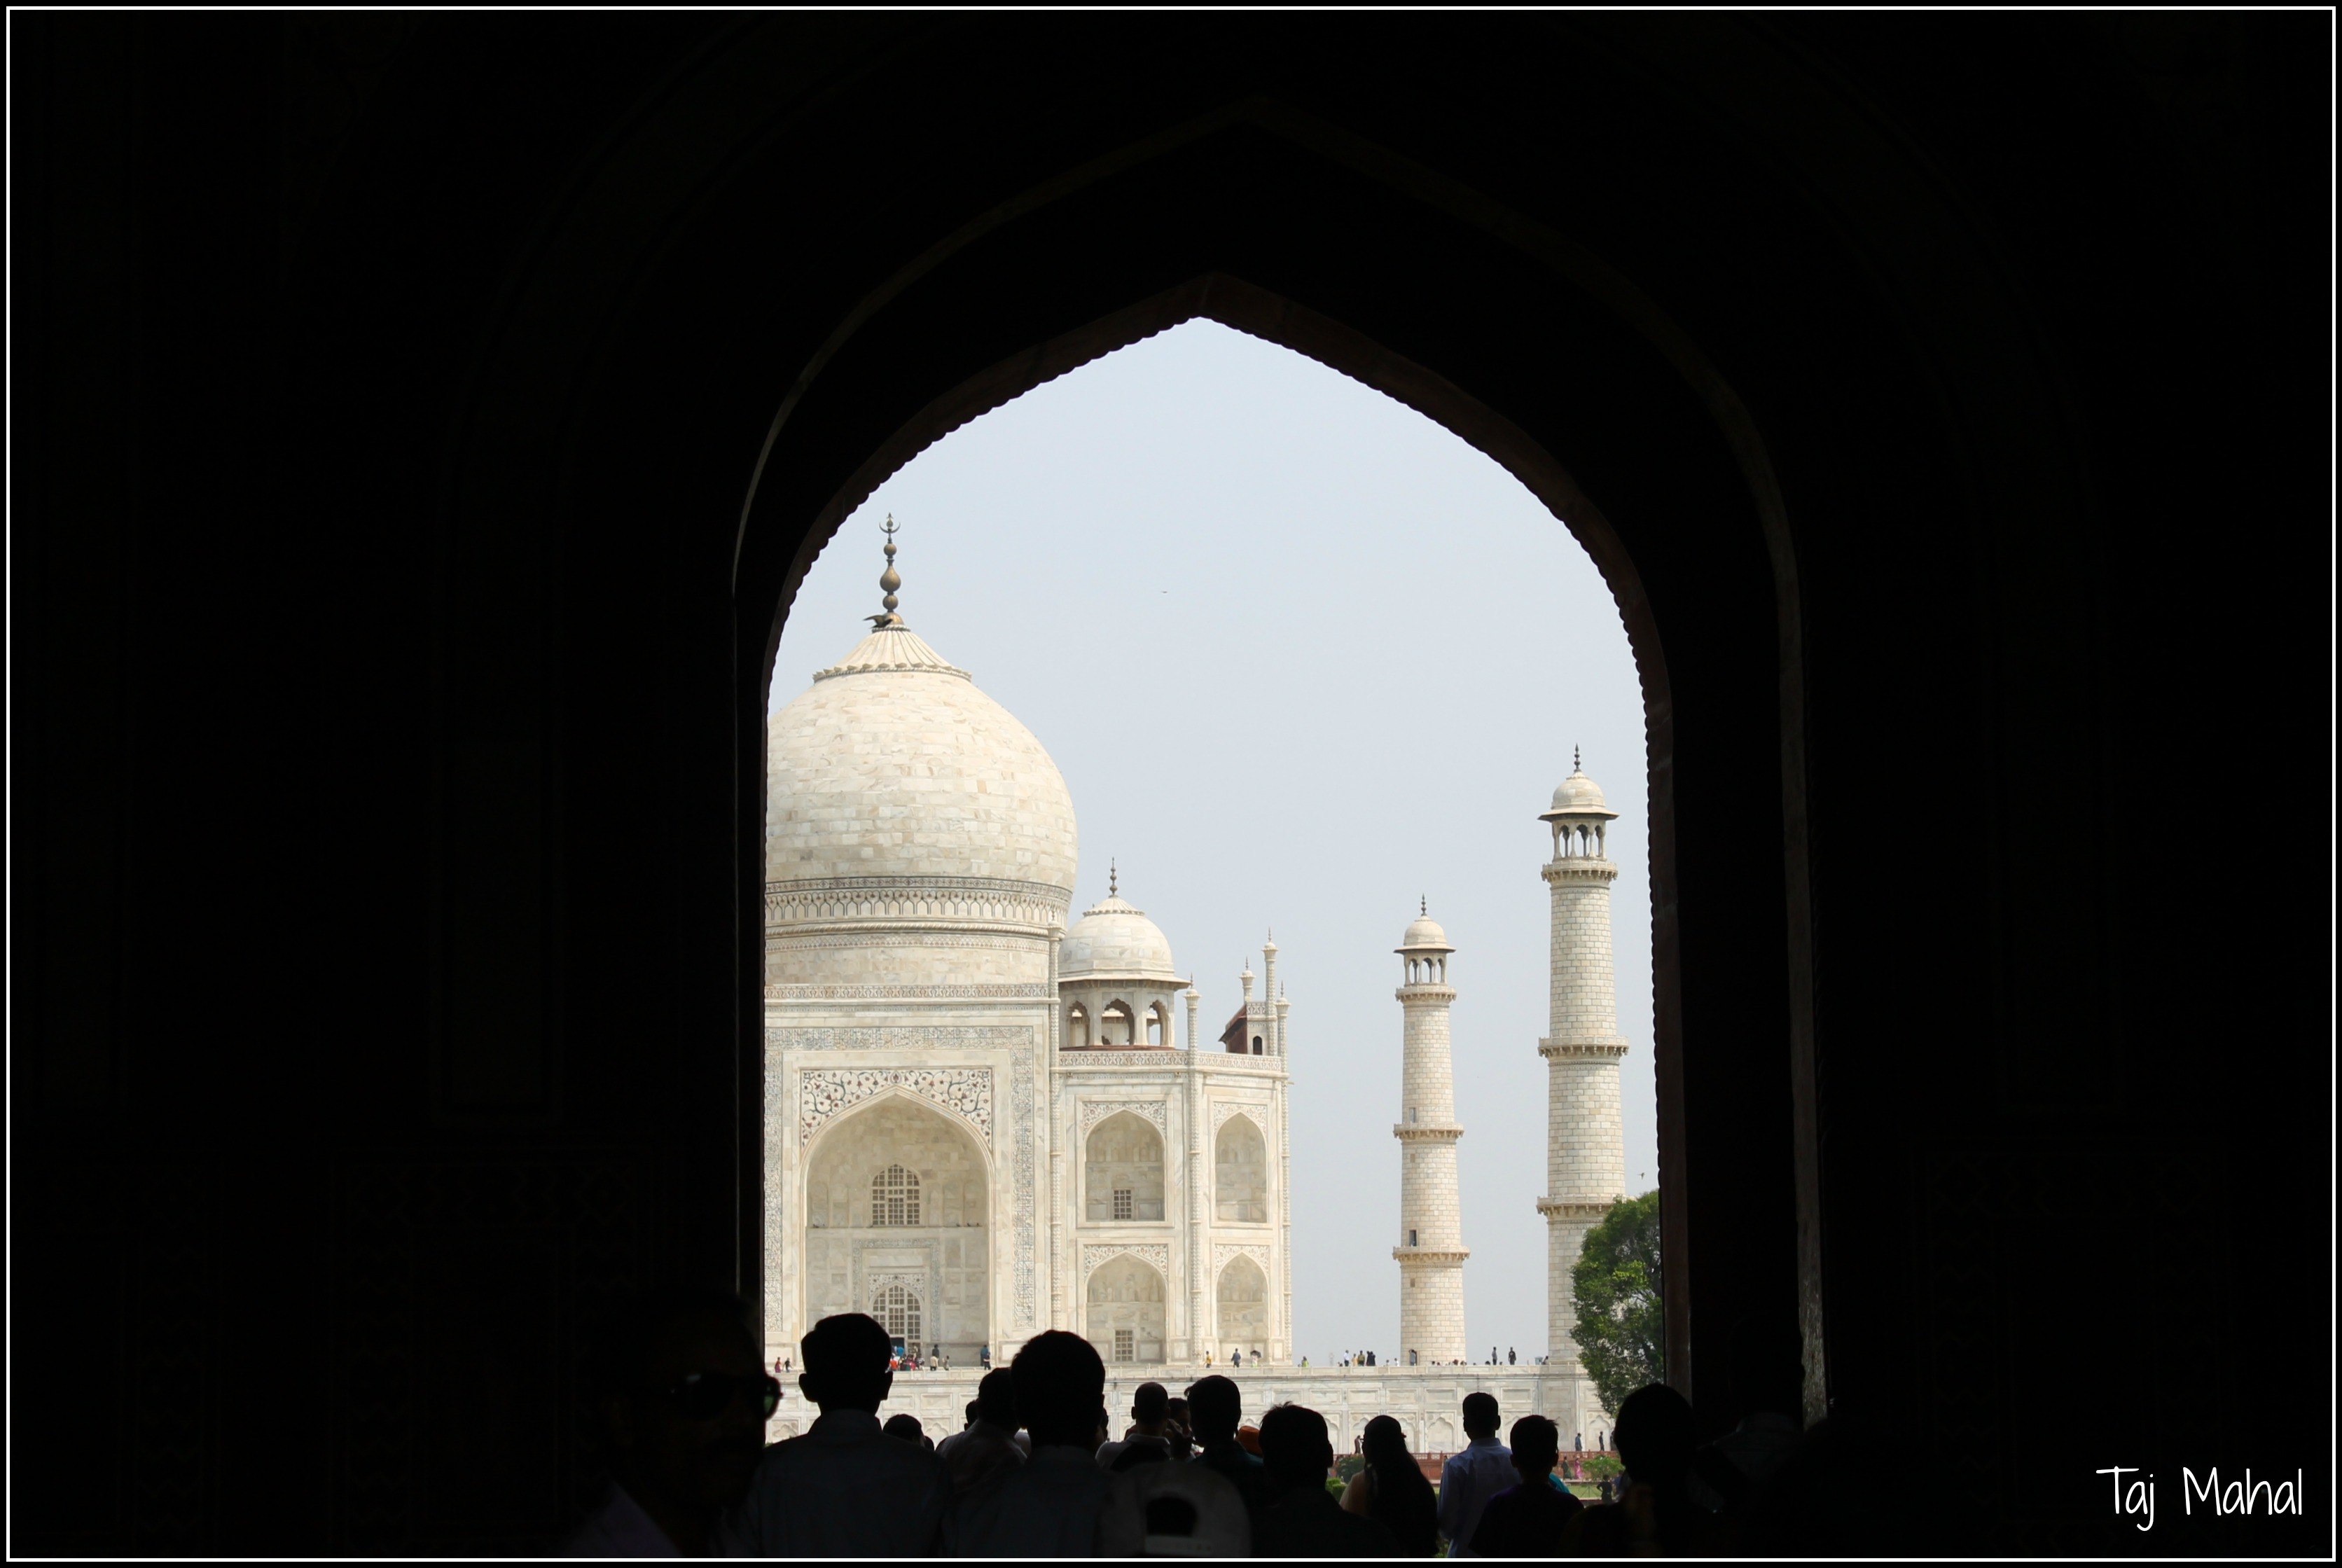 The Colors of India - Taj Mahal